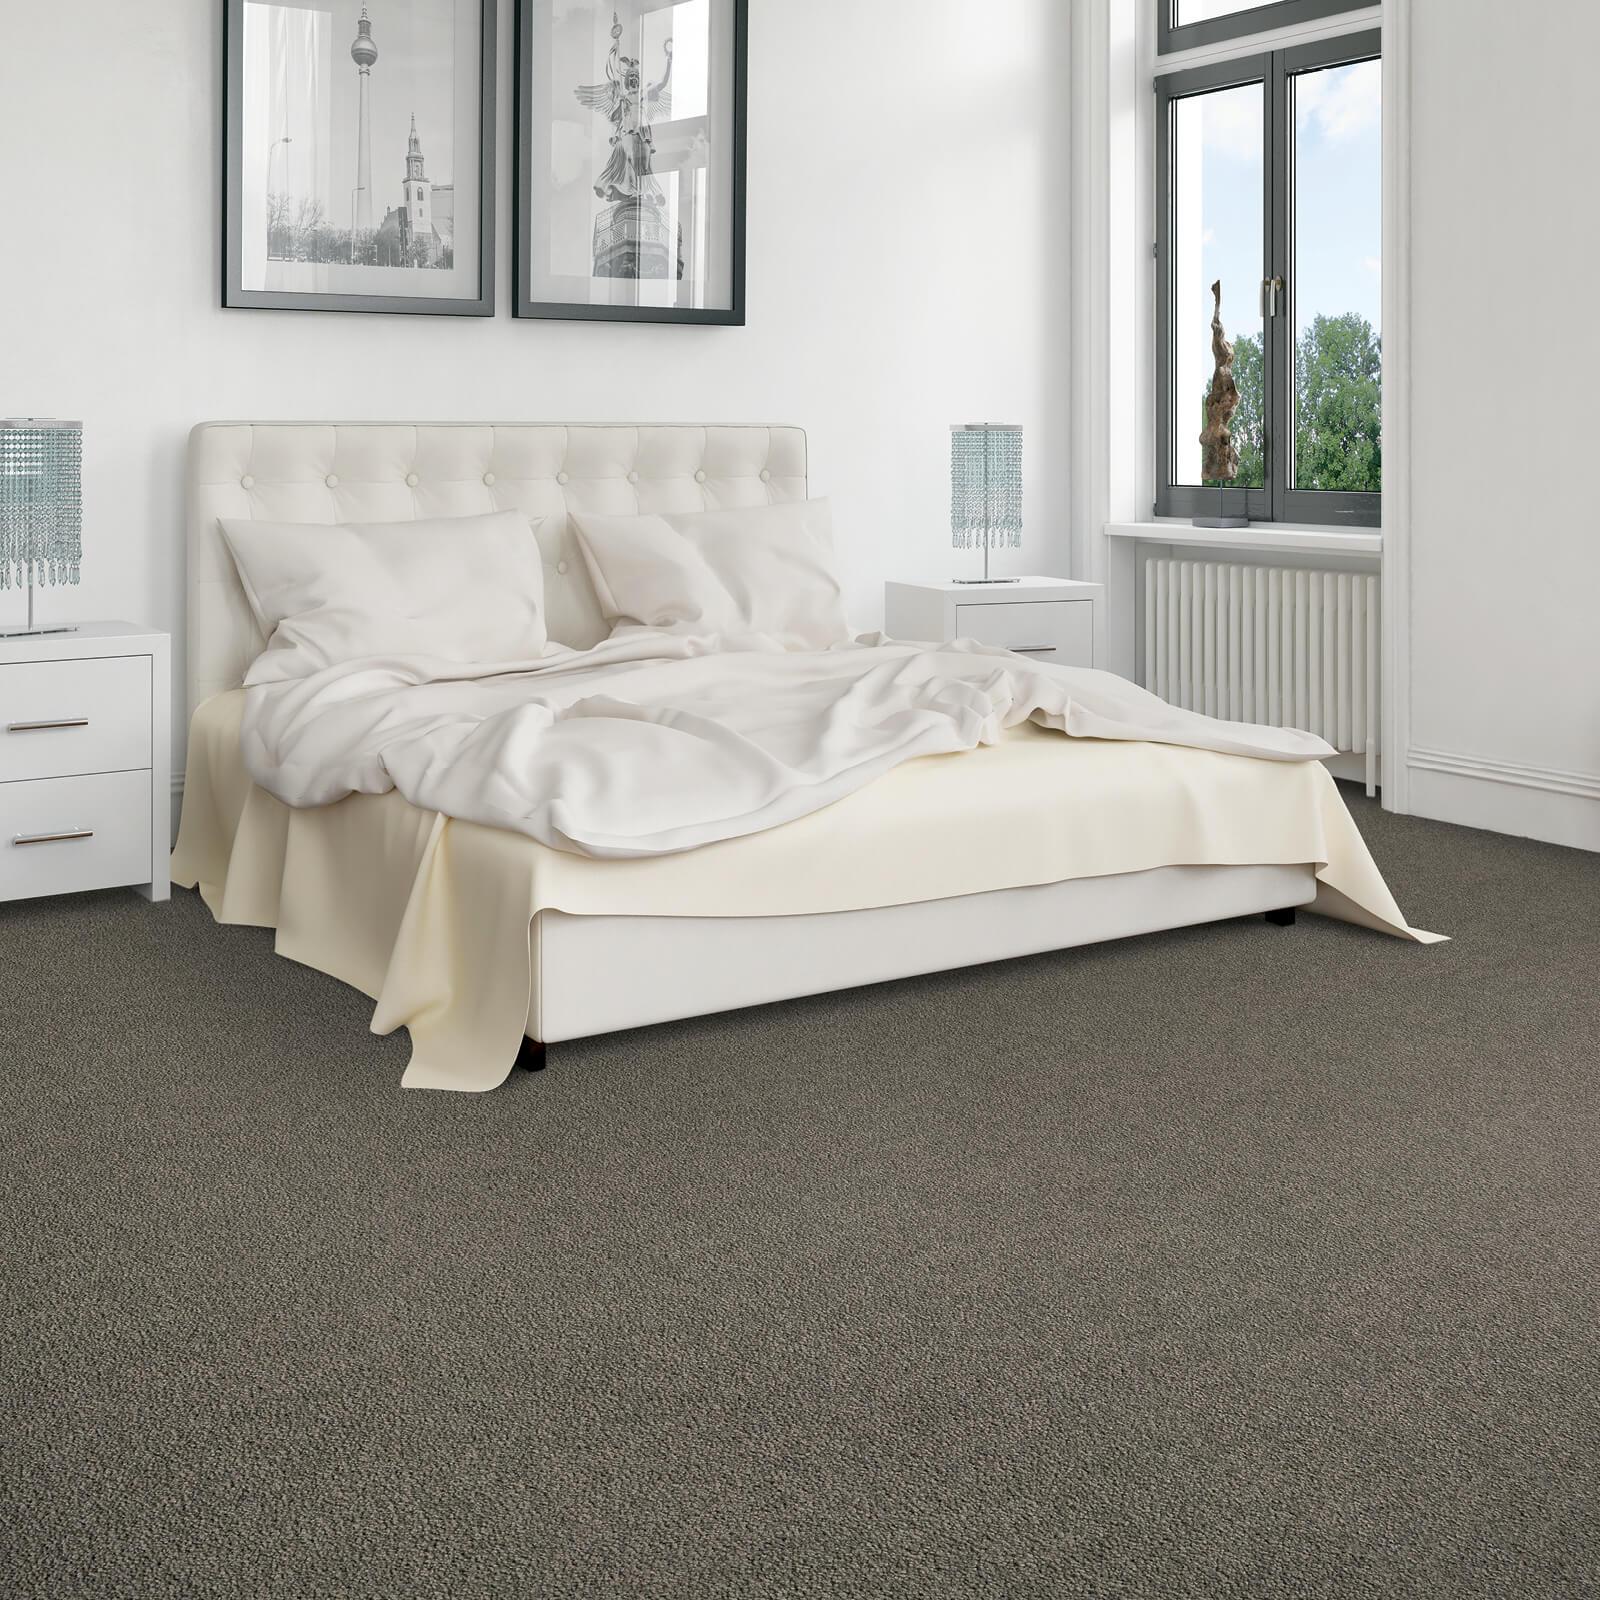 Bedroom carpet | Dolphin Carpet & Tile